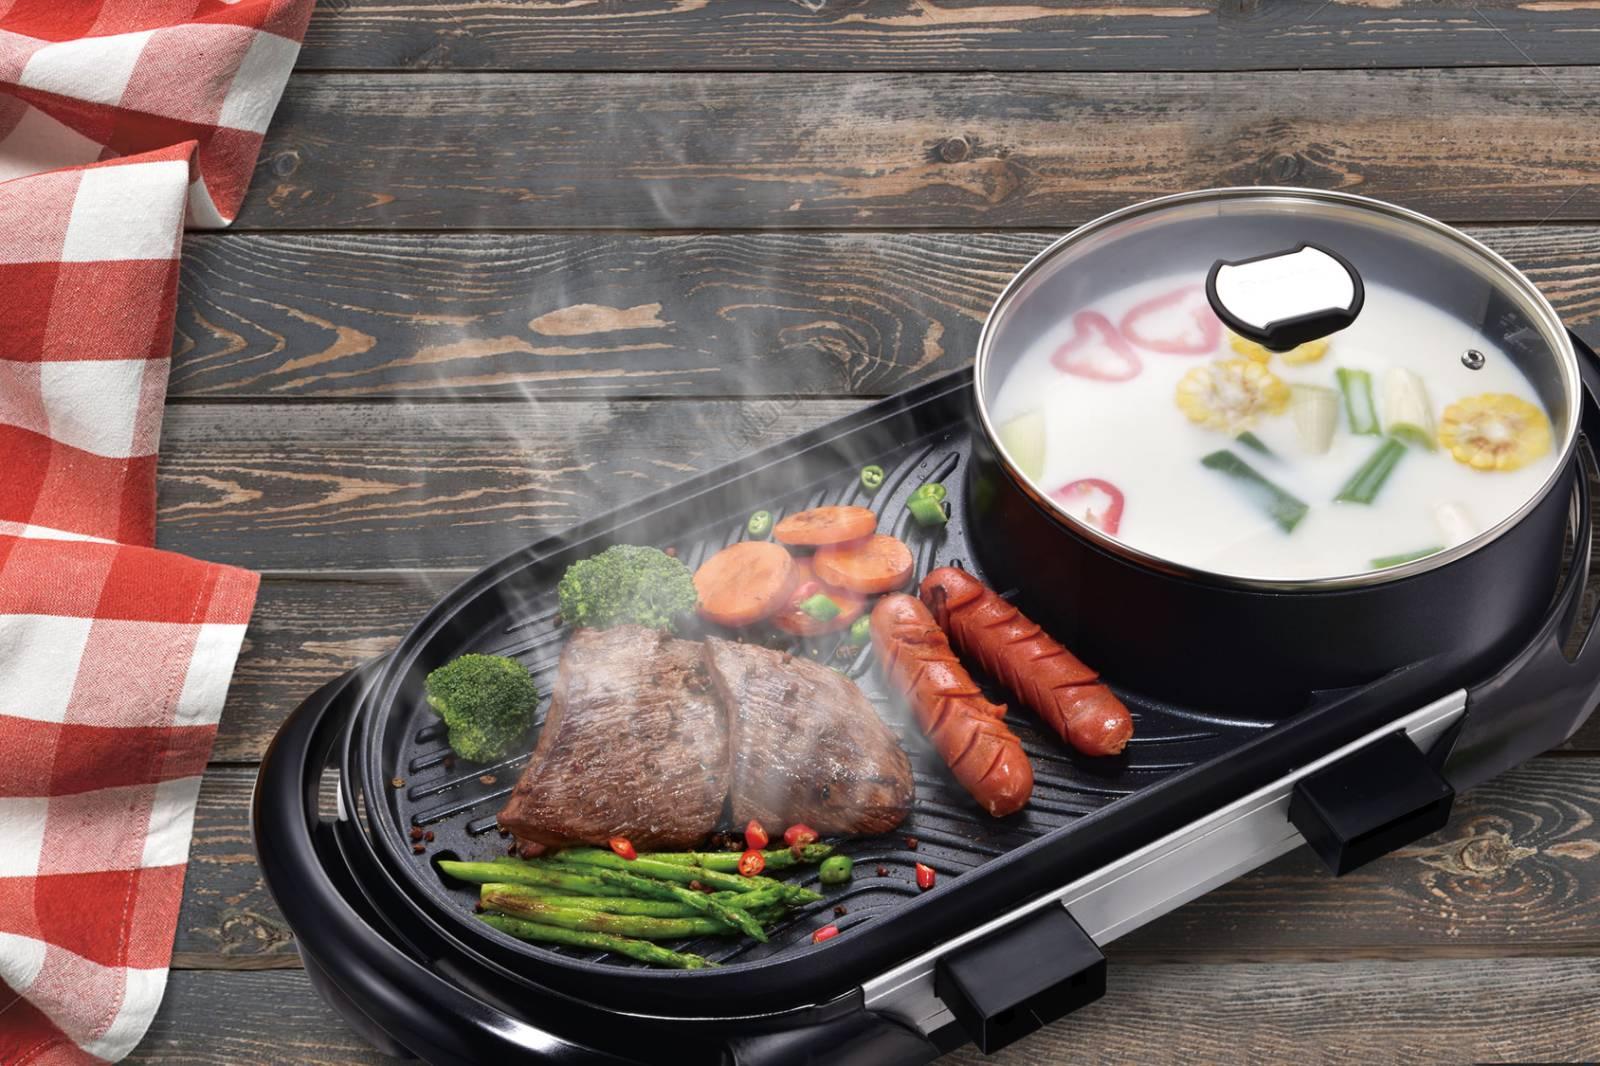 Hanabishi Hotpot BBQ Griller HHOTPOTBBQ200